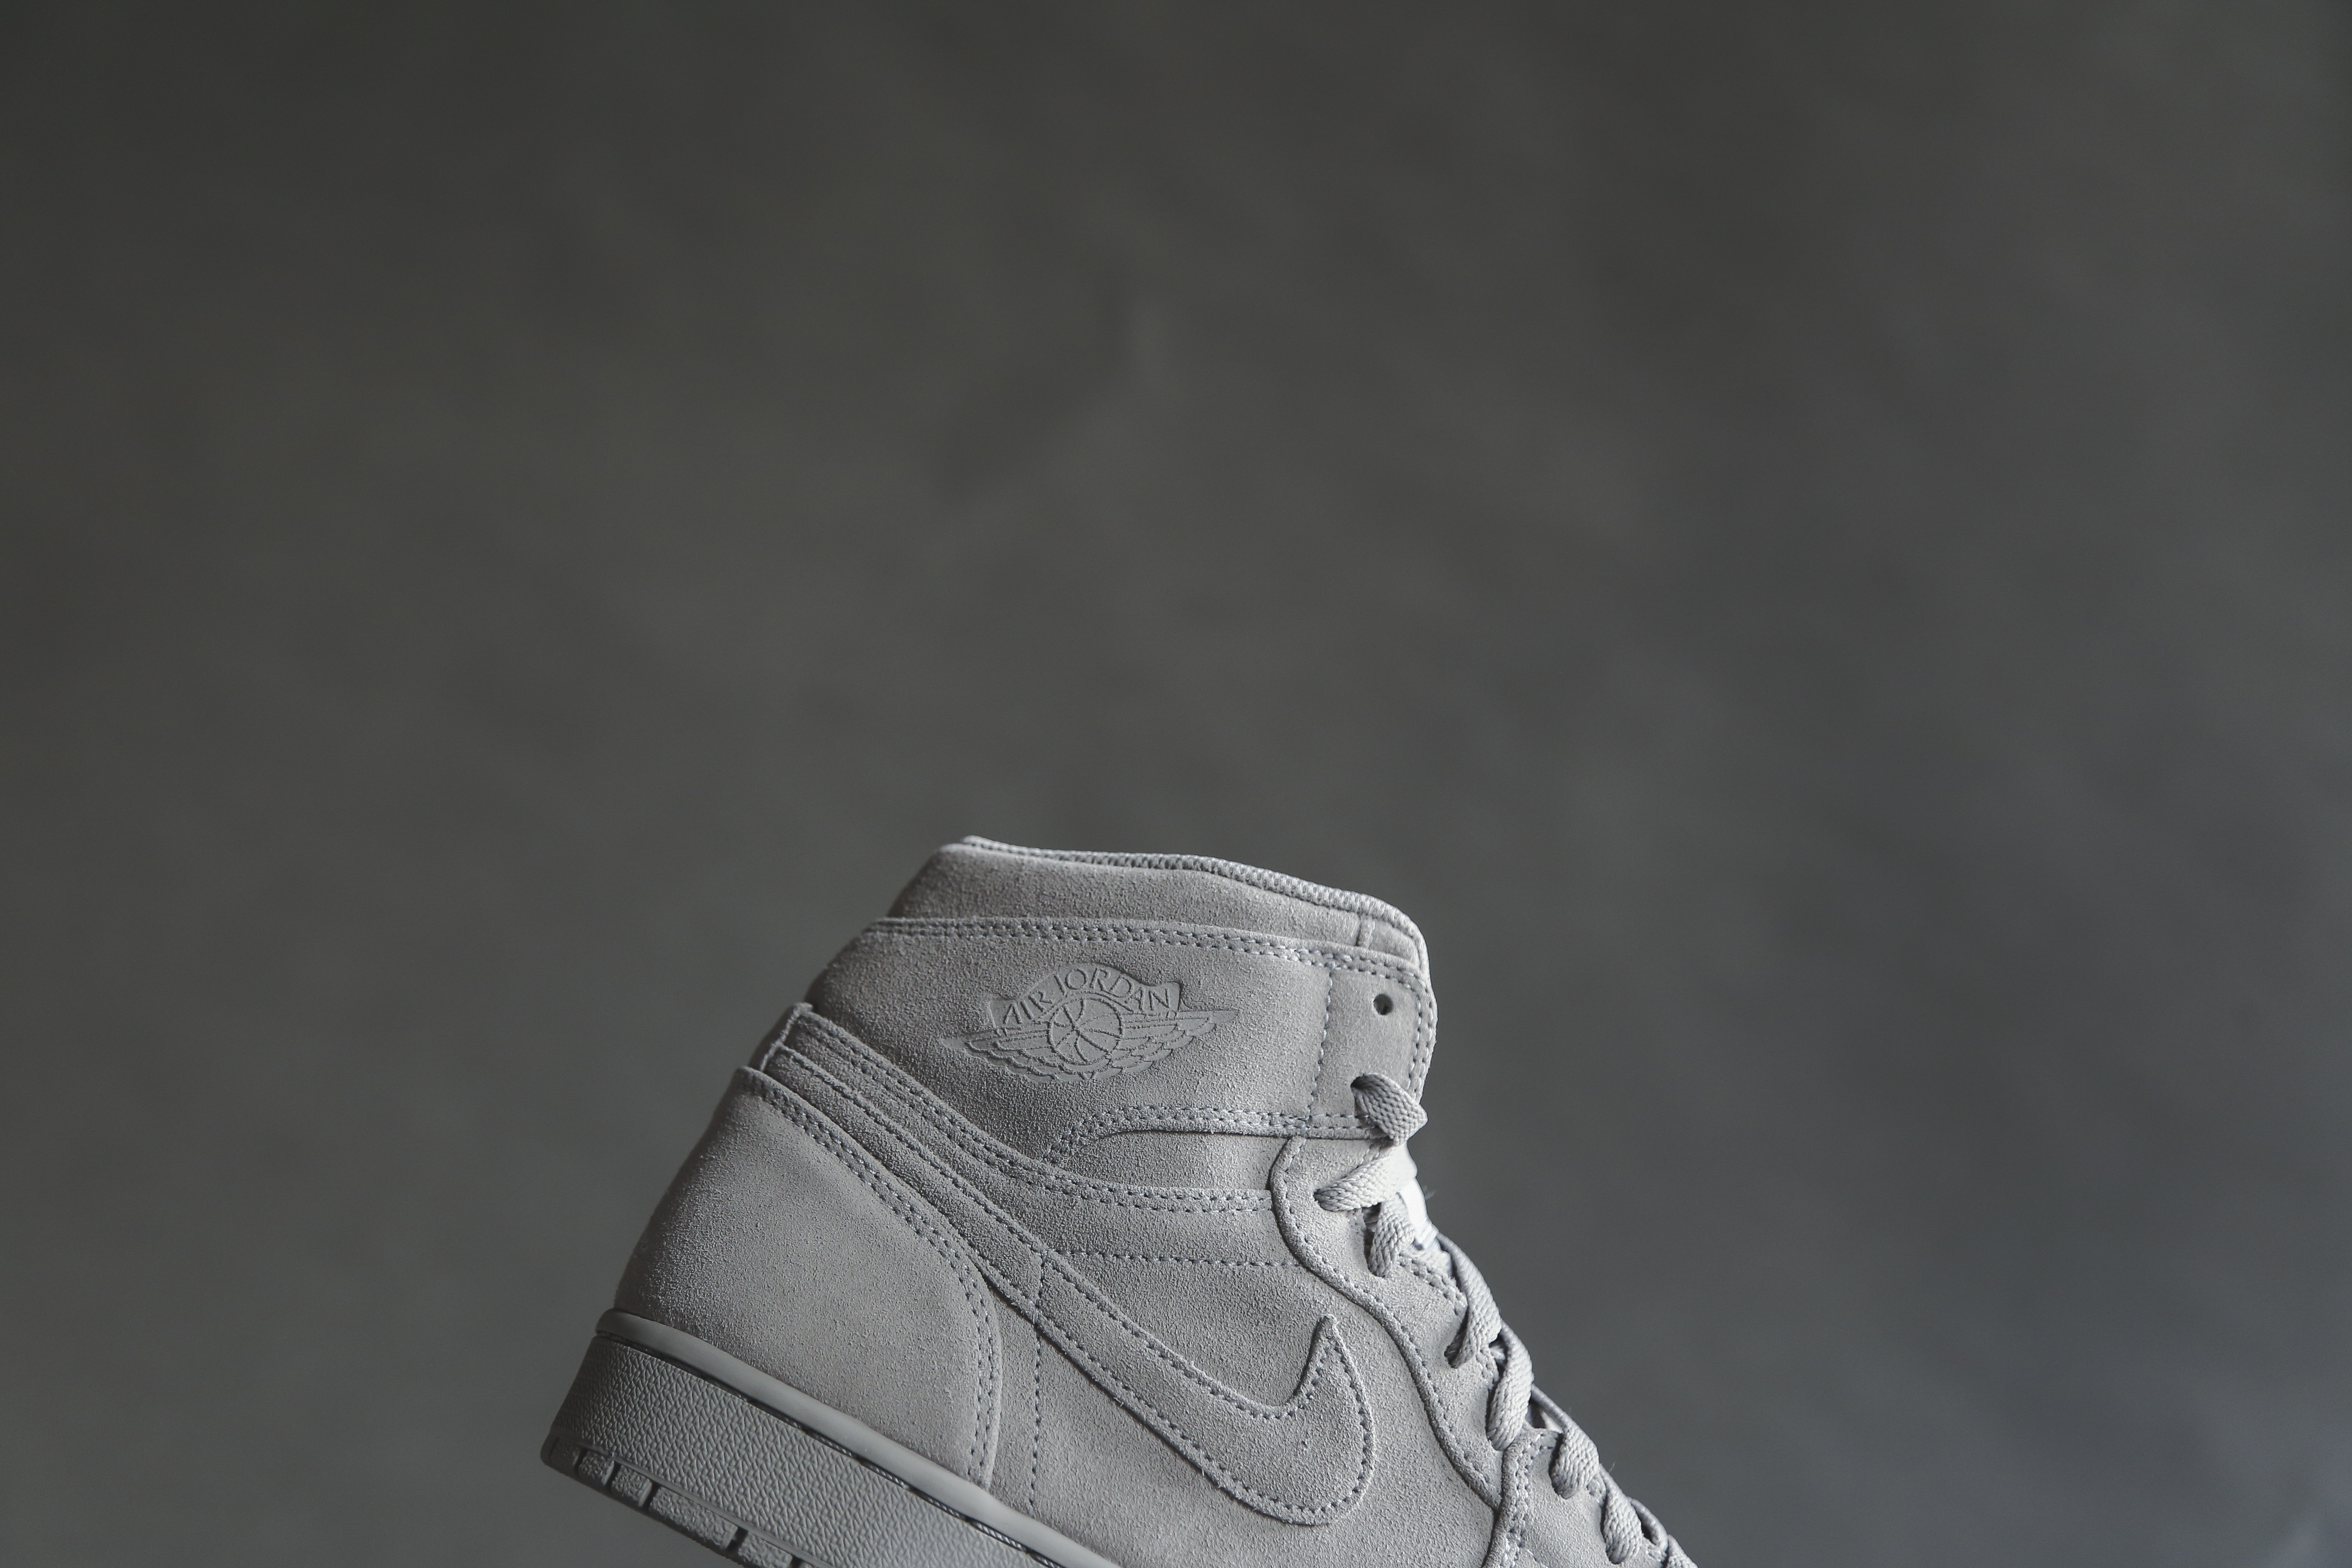 df40a02283e4 Jordan Brand Air Jordan 1 Retro High Wolf Grey Suede Size 10.5 - Hi ...